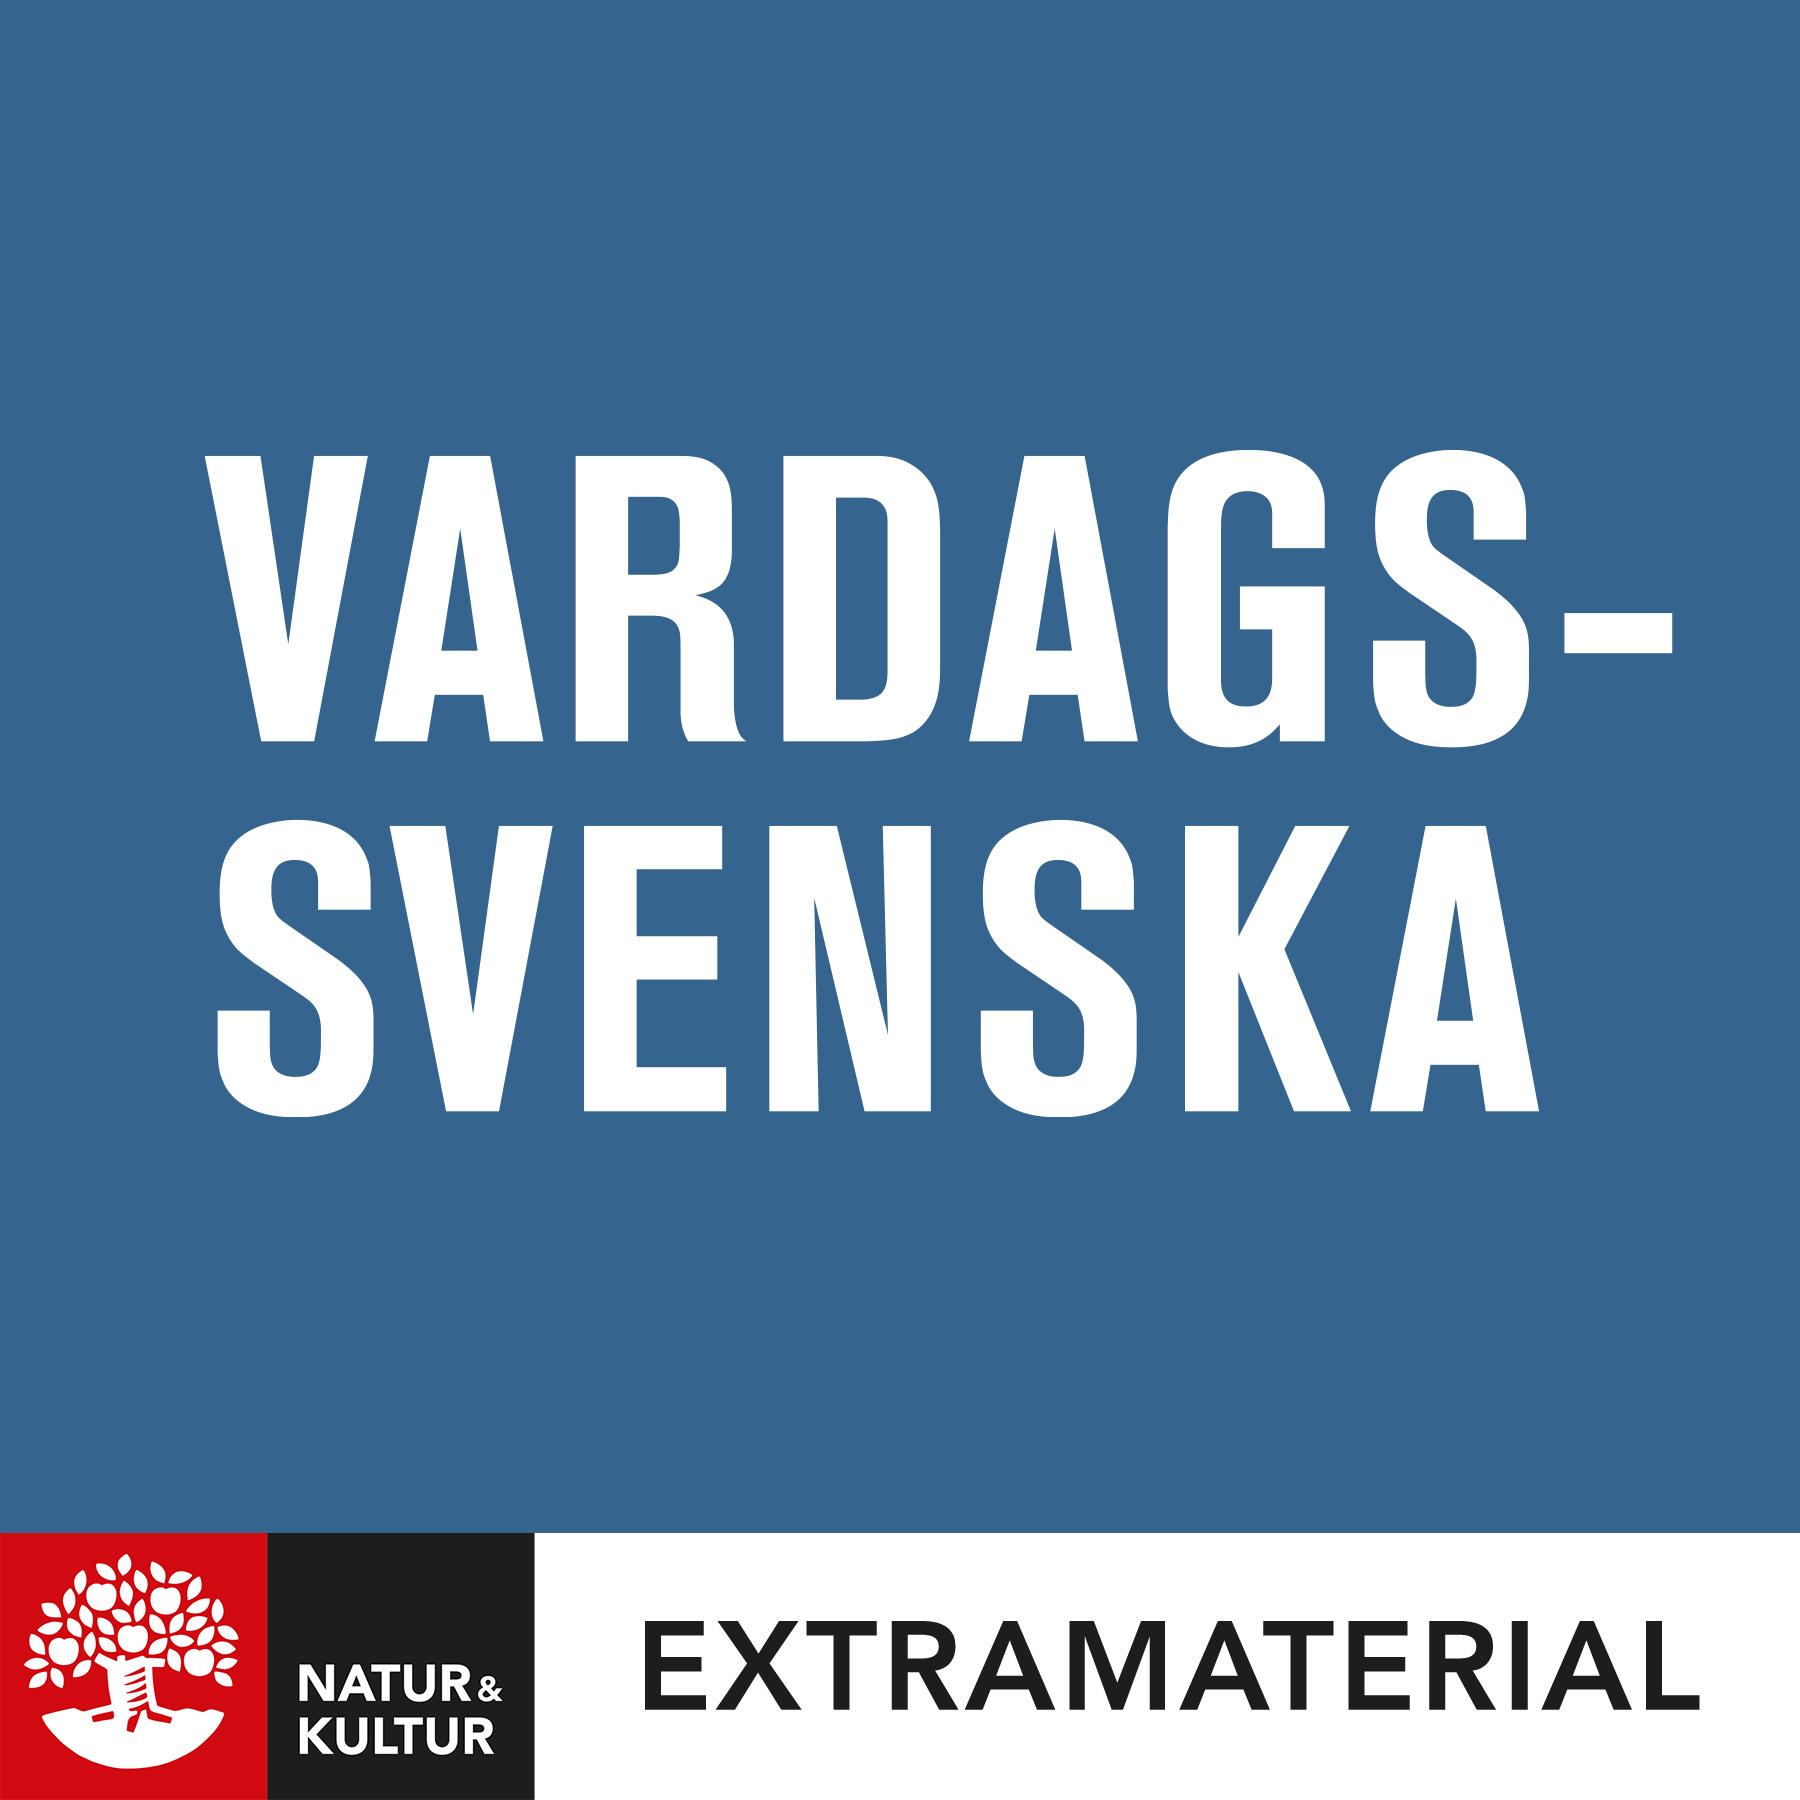 Vardagssvenska